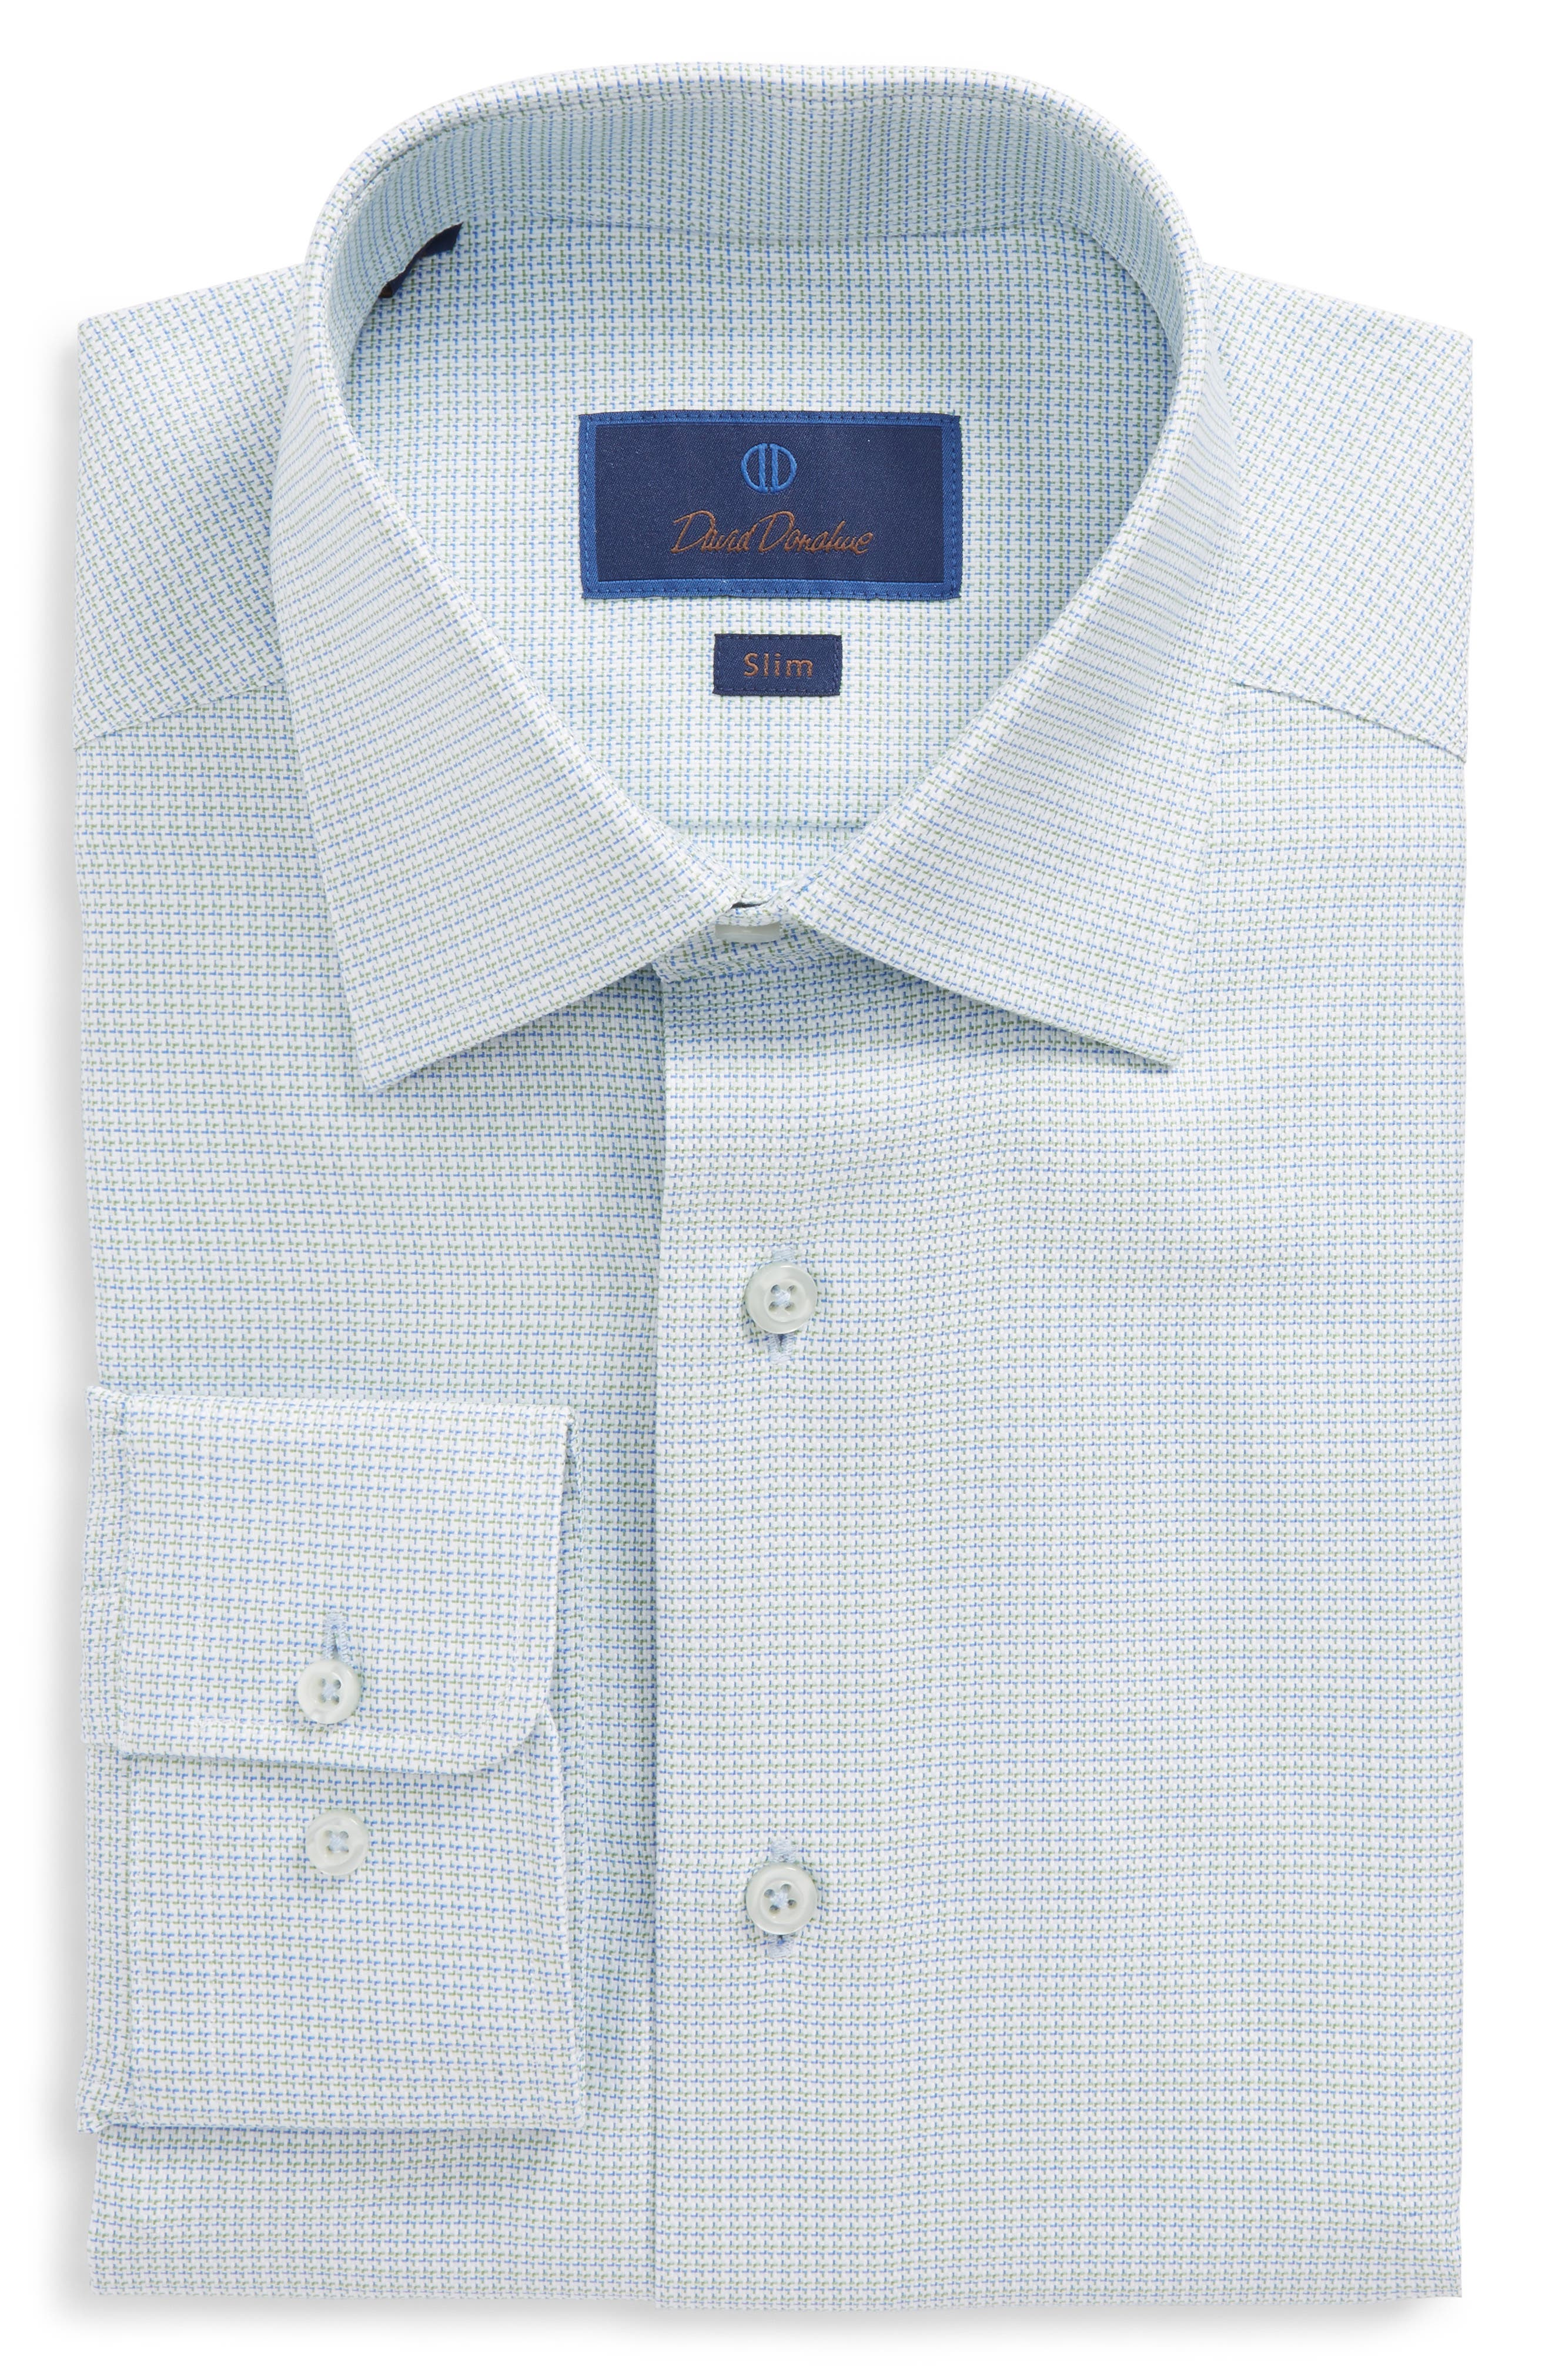 Slim Fit Solid Dress Shirt,                             Main thumbnail 1, color,                             310